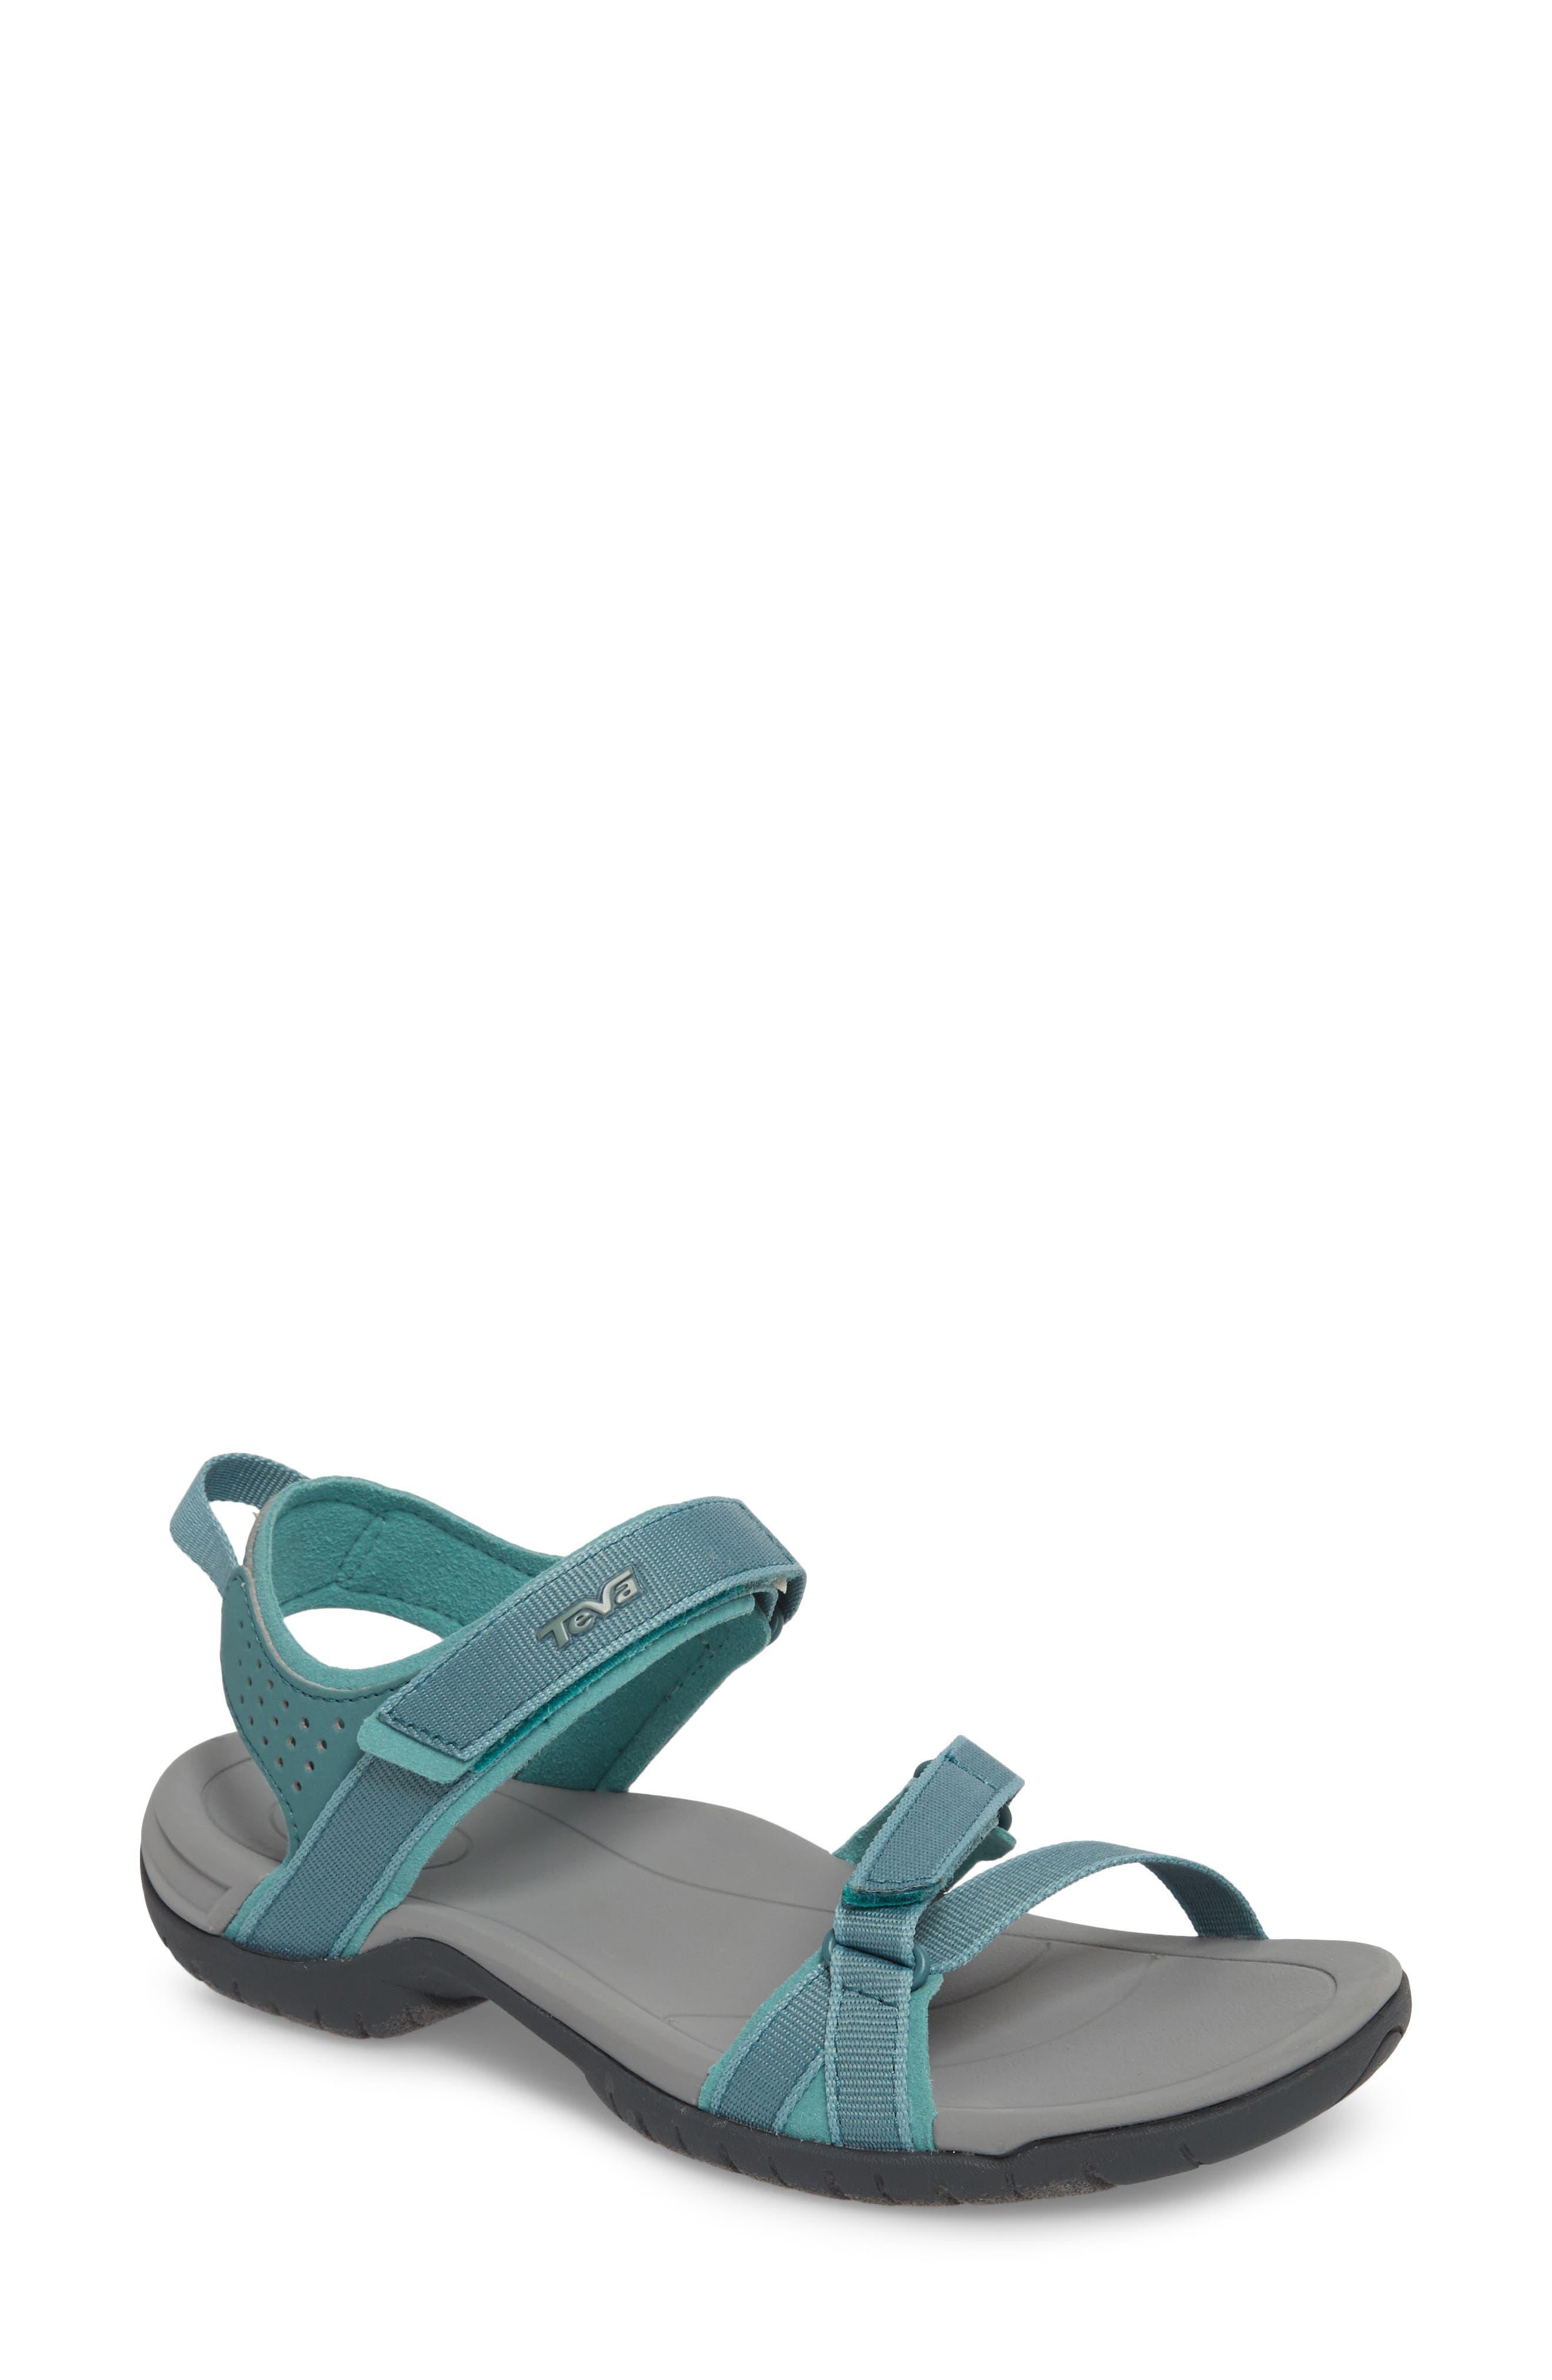 'Verra' Sandal,                             Main thumbnail 1, color,                             NORTH ATLANTIC